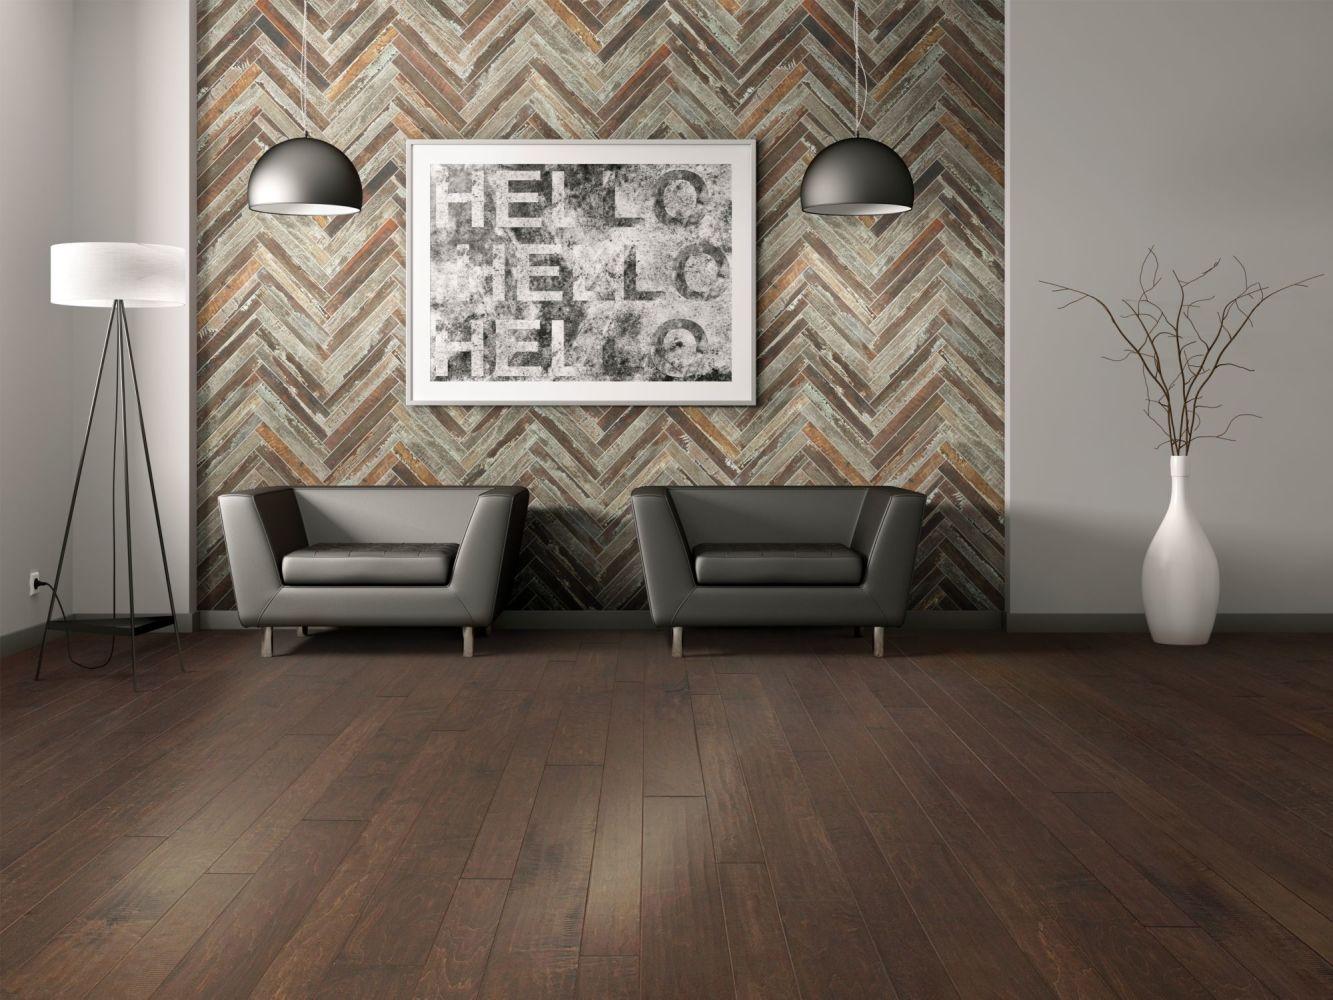 Shaw Floors Home Fn Gold Ceramic Forge Herrinbone Mosaic Iron 00267_TG54D